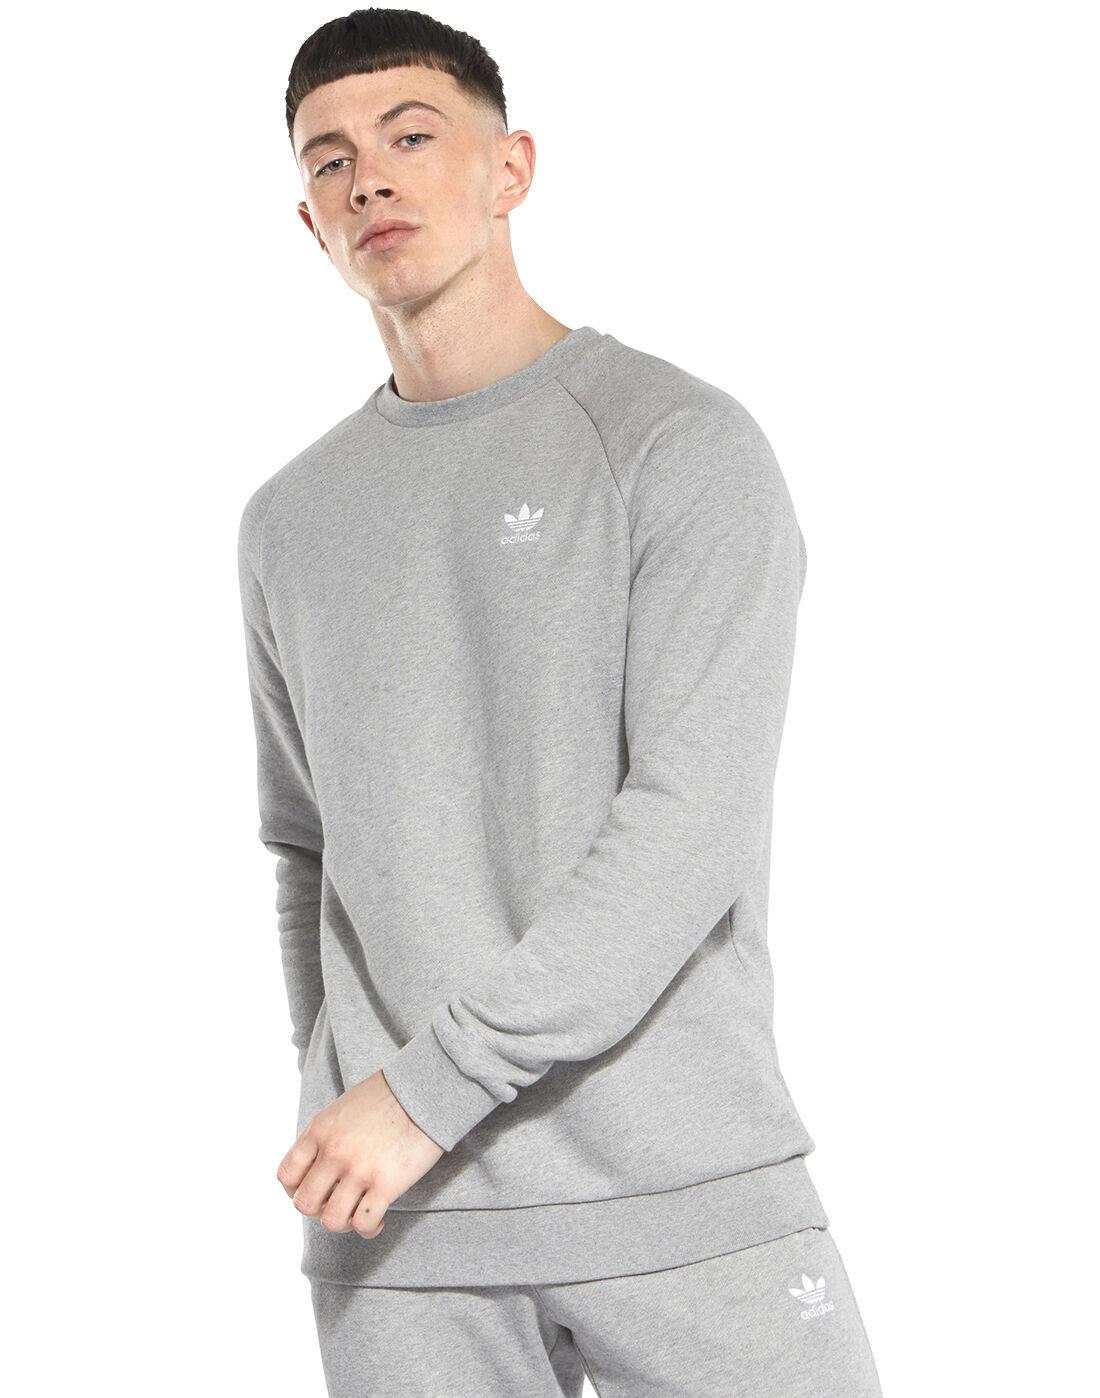 Men/'s Authentic  adidas Essential Sweatshirt Sizes Large-XL